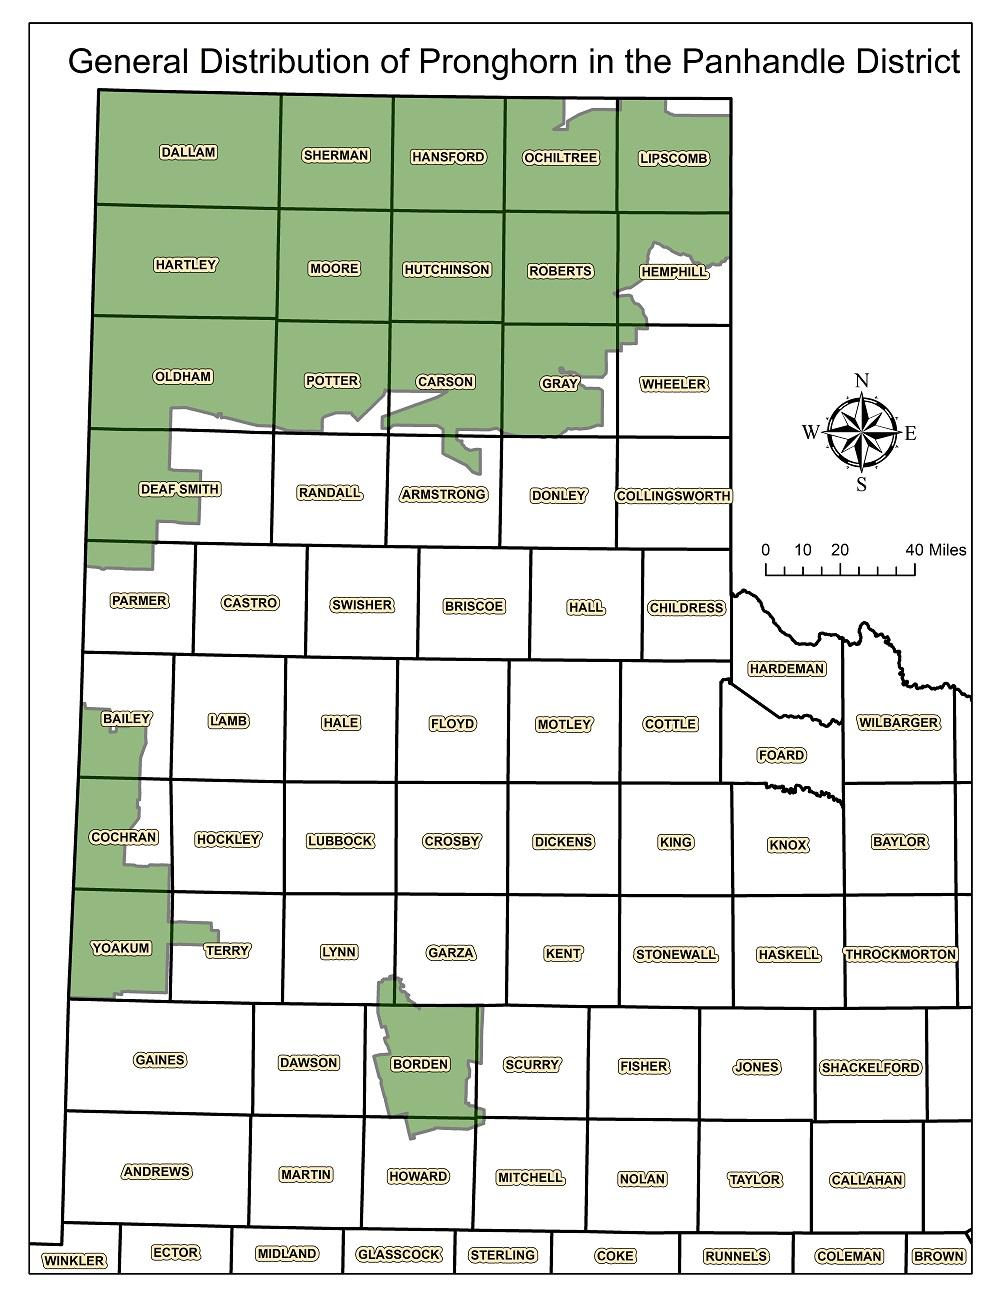 Distribution of Pronghorn Antelope Texas Panhandle